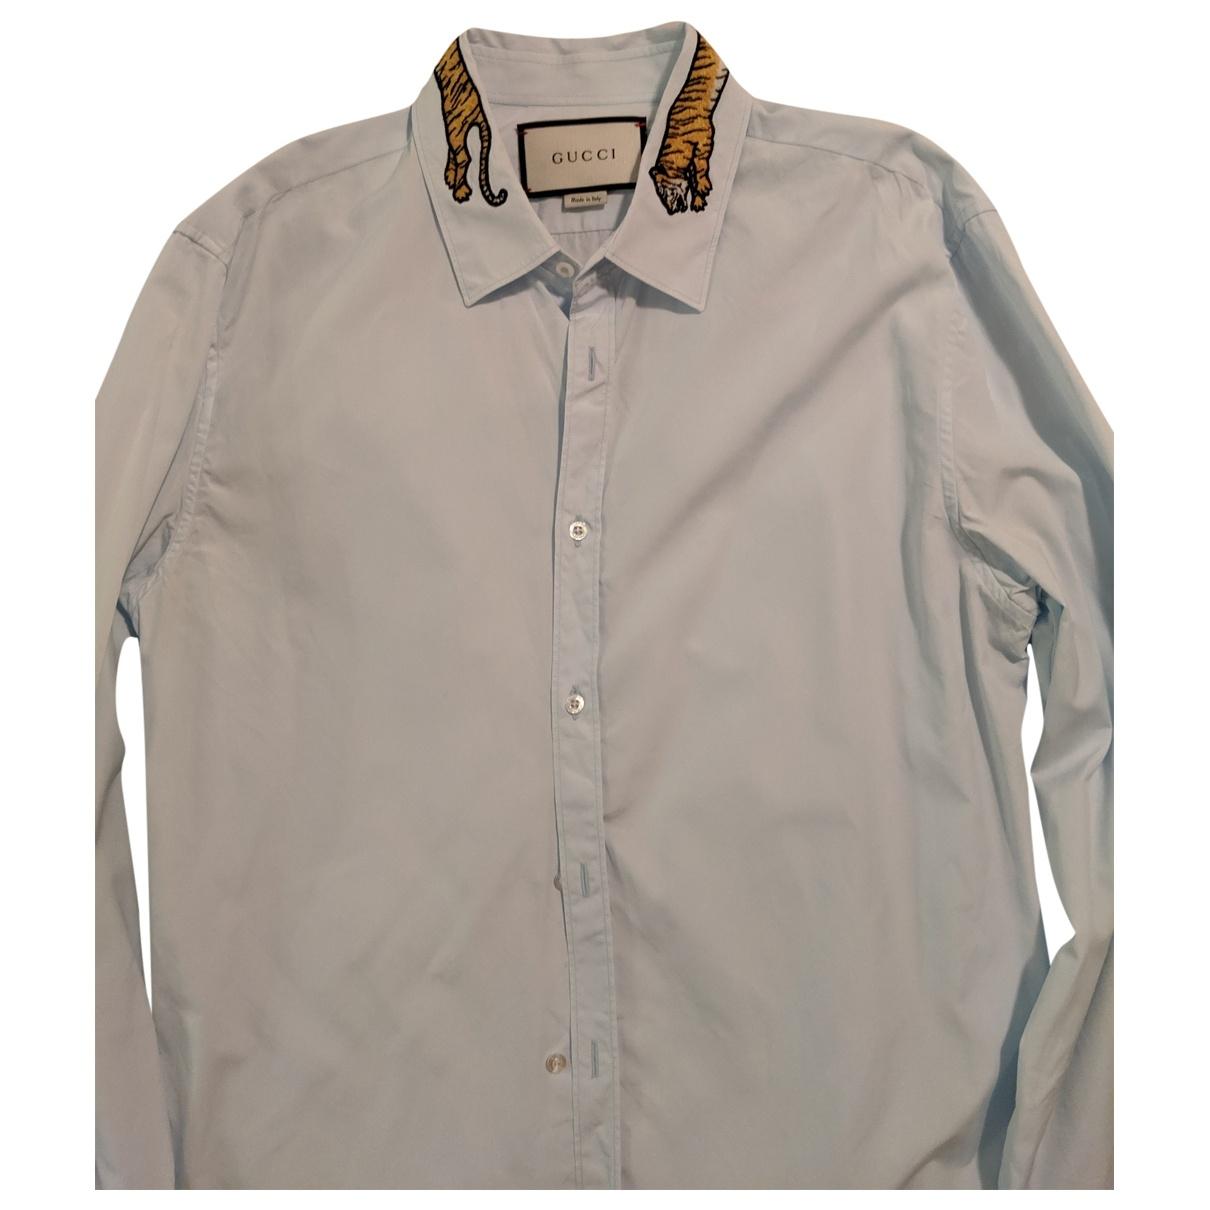 Gucci \N Blue Cotton Shirts for Men 41 EU (tour de cou / collar)